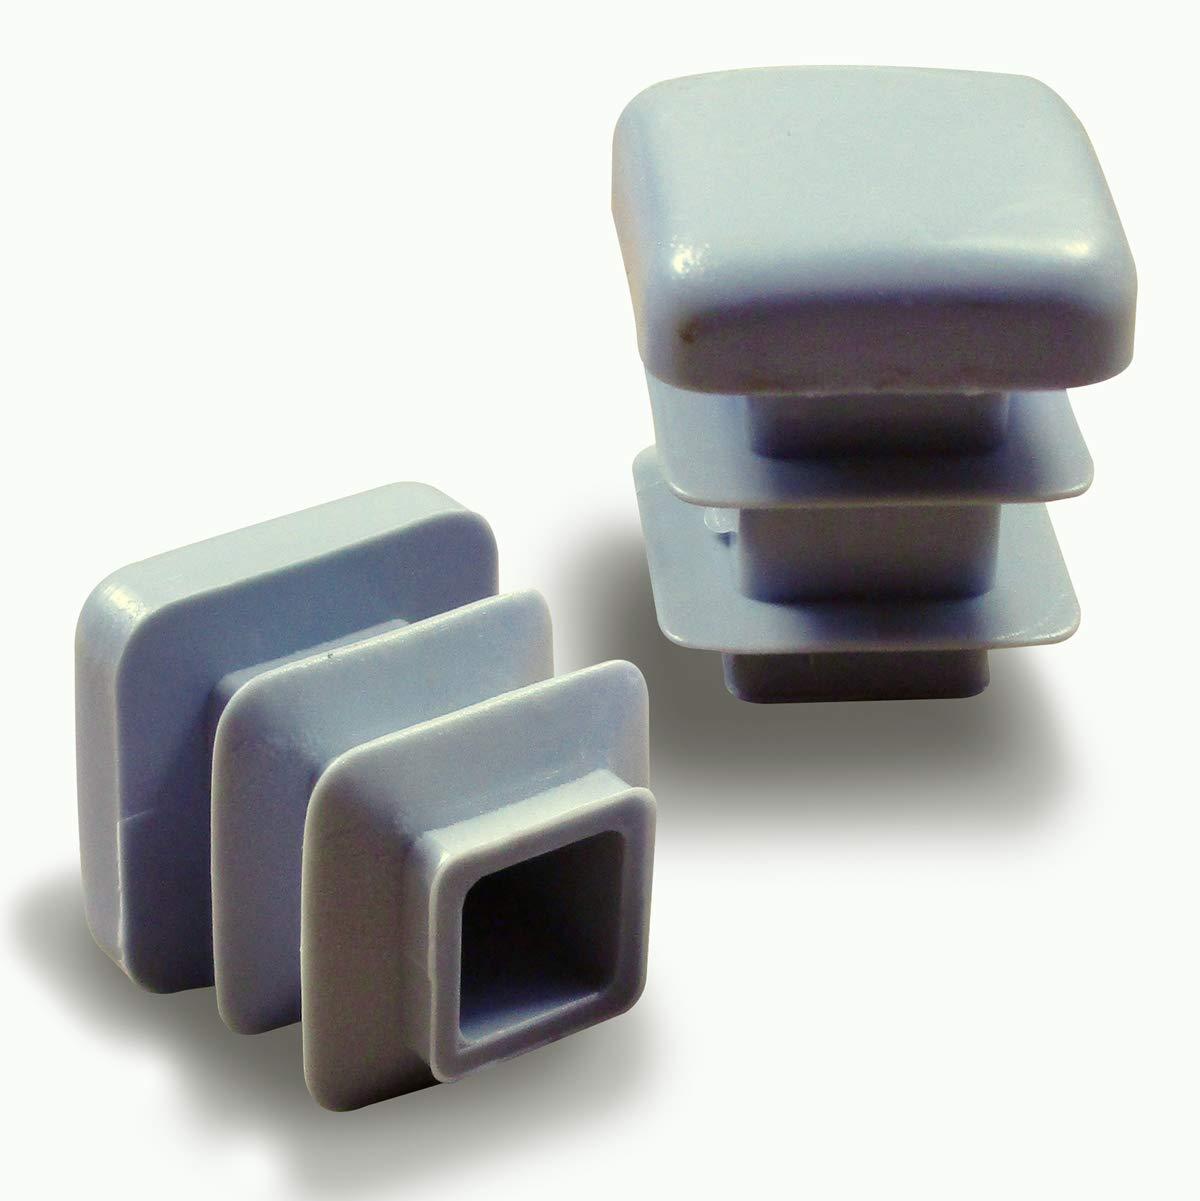 GRIS Ajile/® Contera plastic/ó redonda de interior para tubo esterior di/ámetro 13 mm EPR313x24-FBA 24 piezas